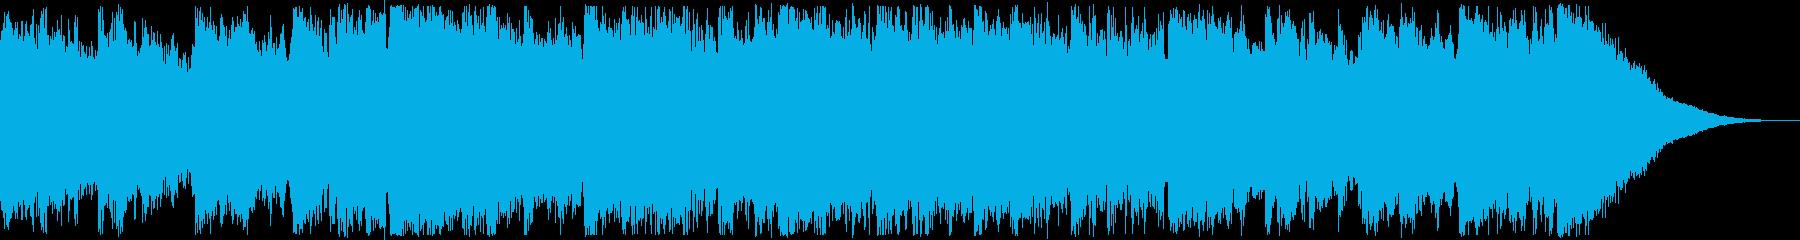 CM・洋楽・爽やかな男性ボーカルポップスの再生済みの波形